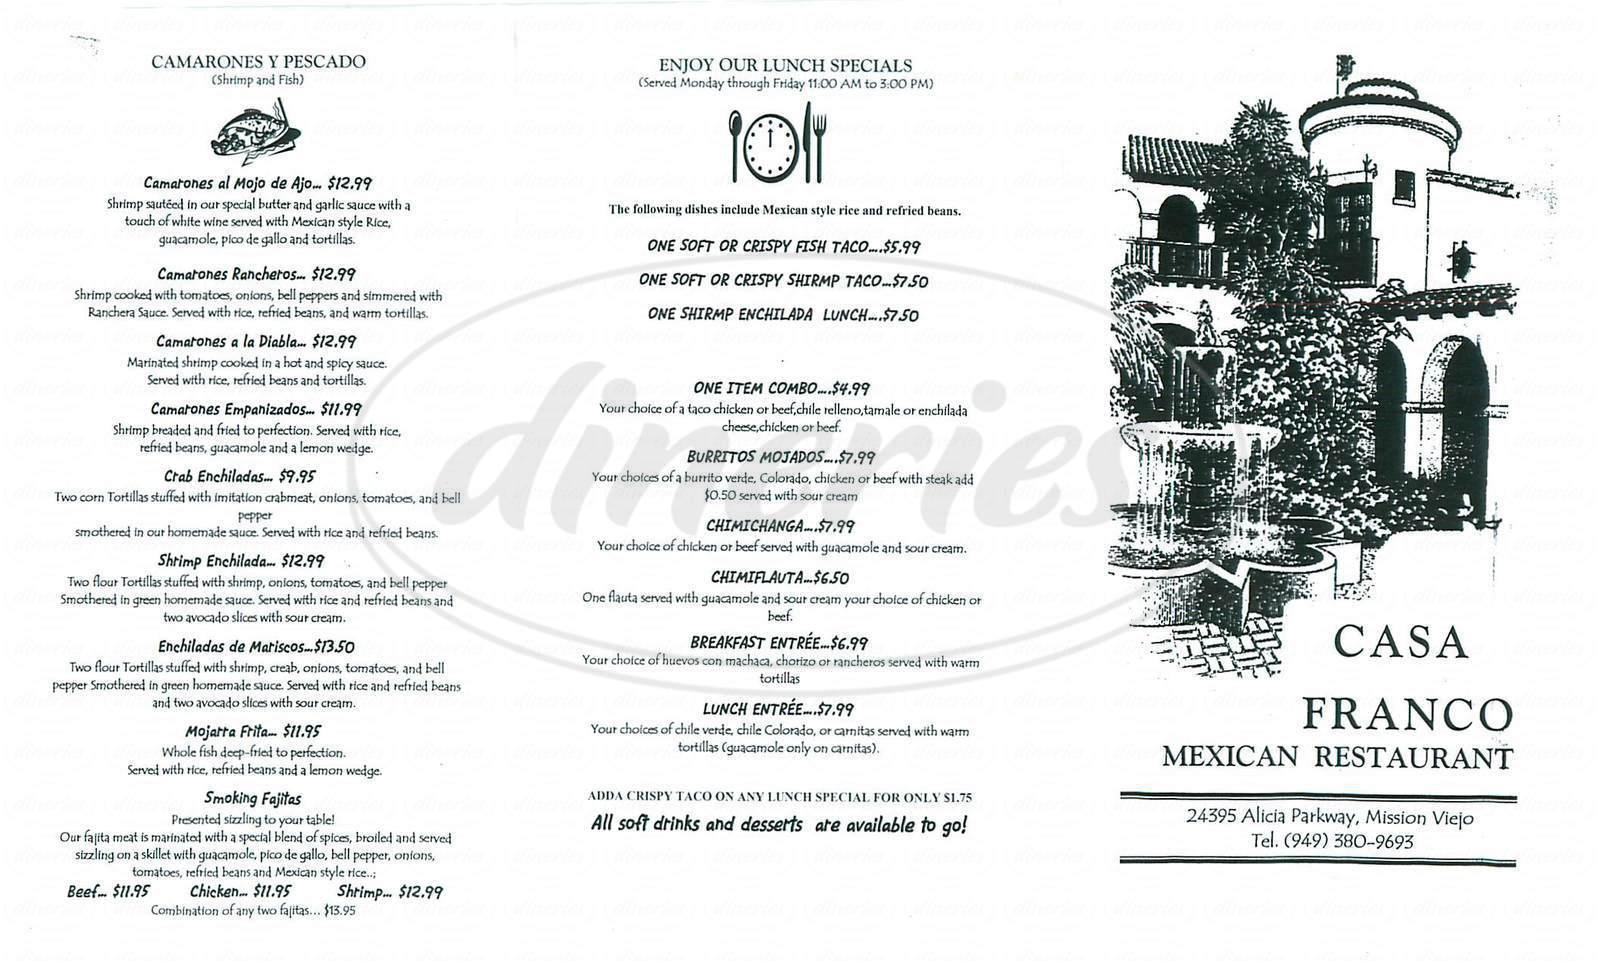 menu for Casa Franco